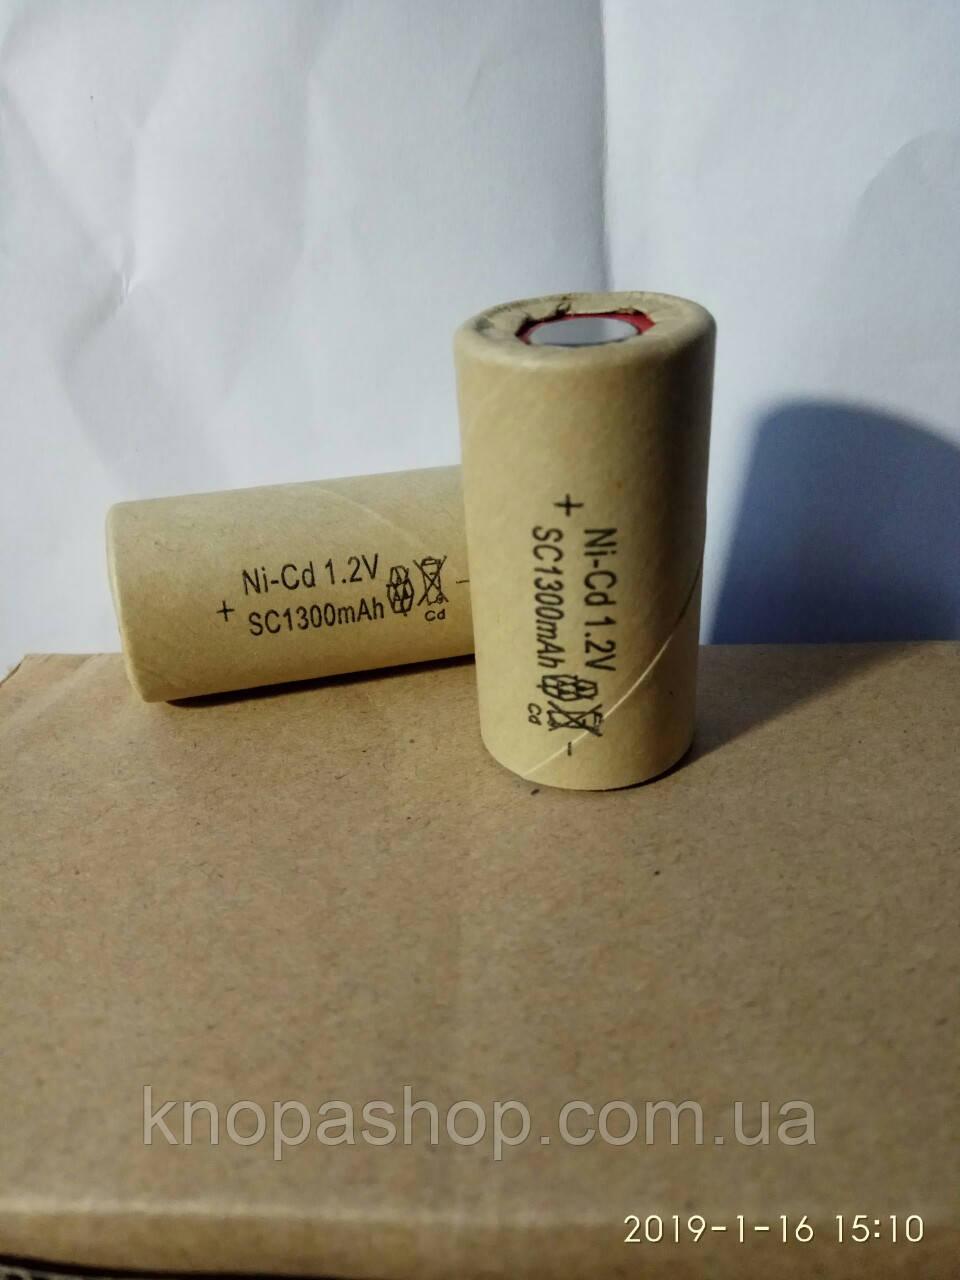 Ni-Cd SC1000mA  1/2V ак-ры(банки)